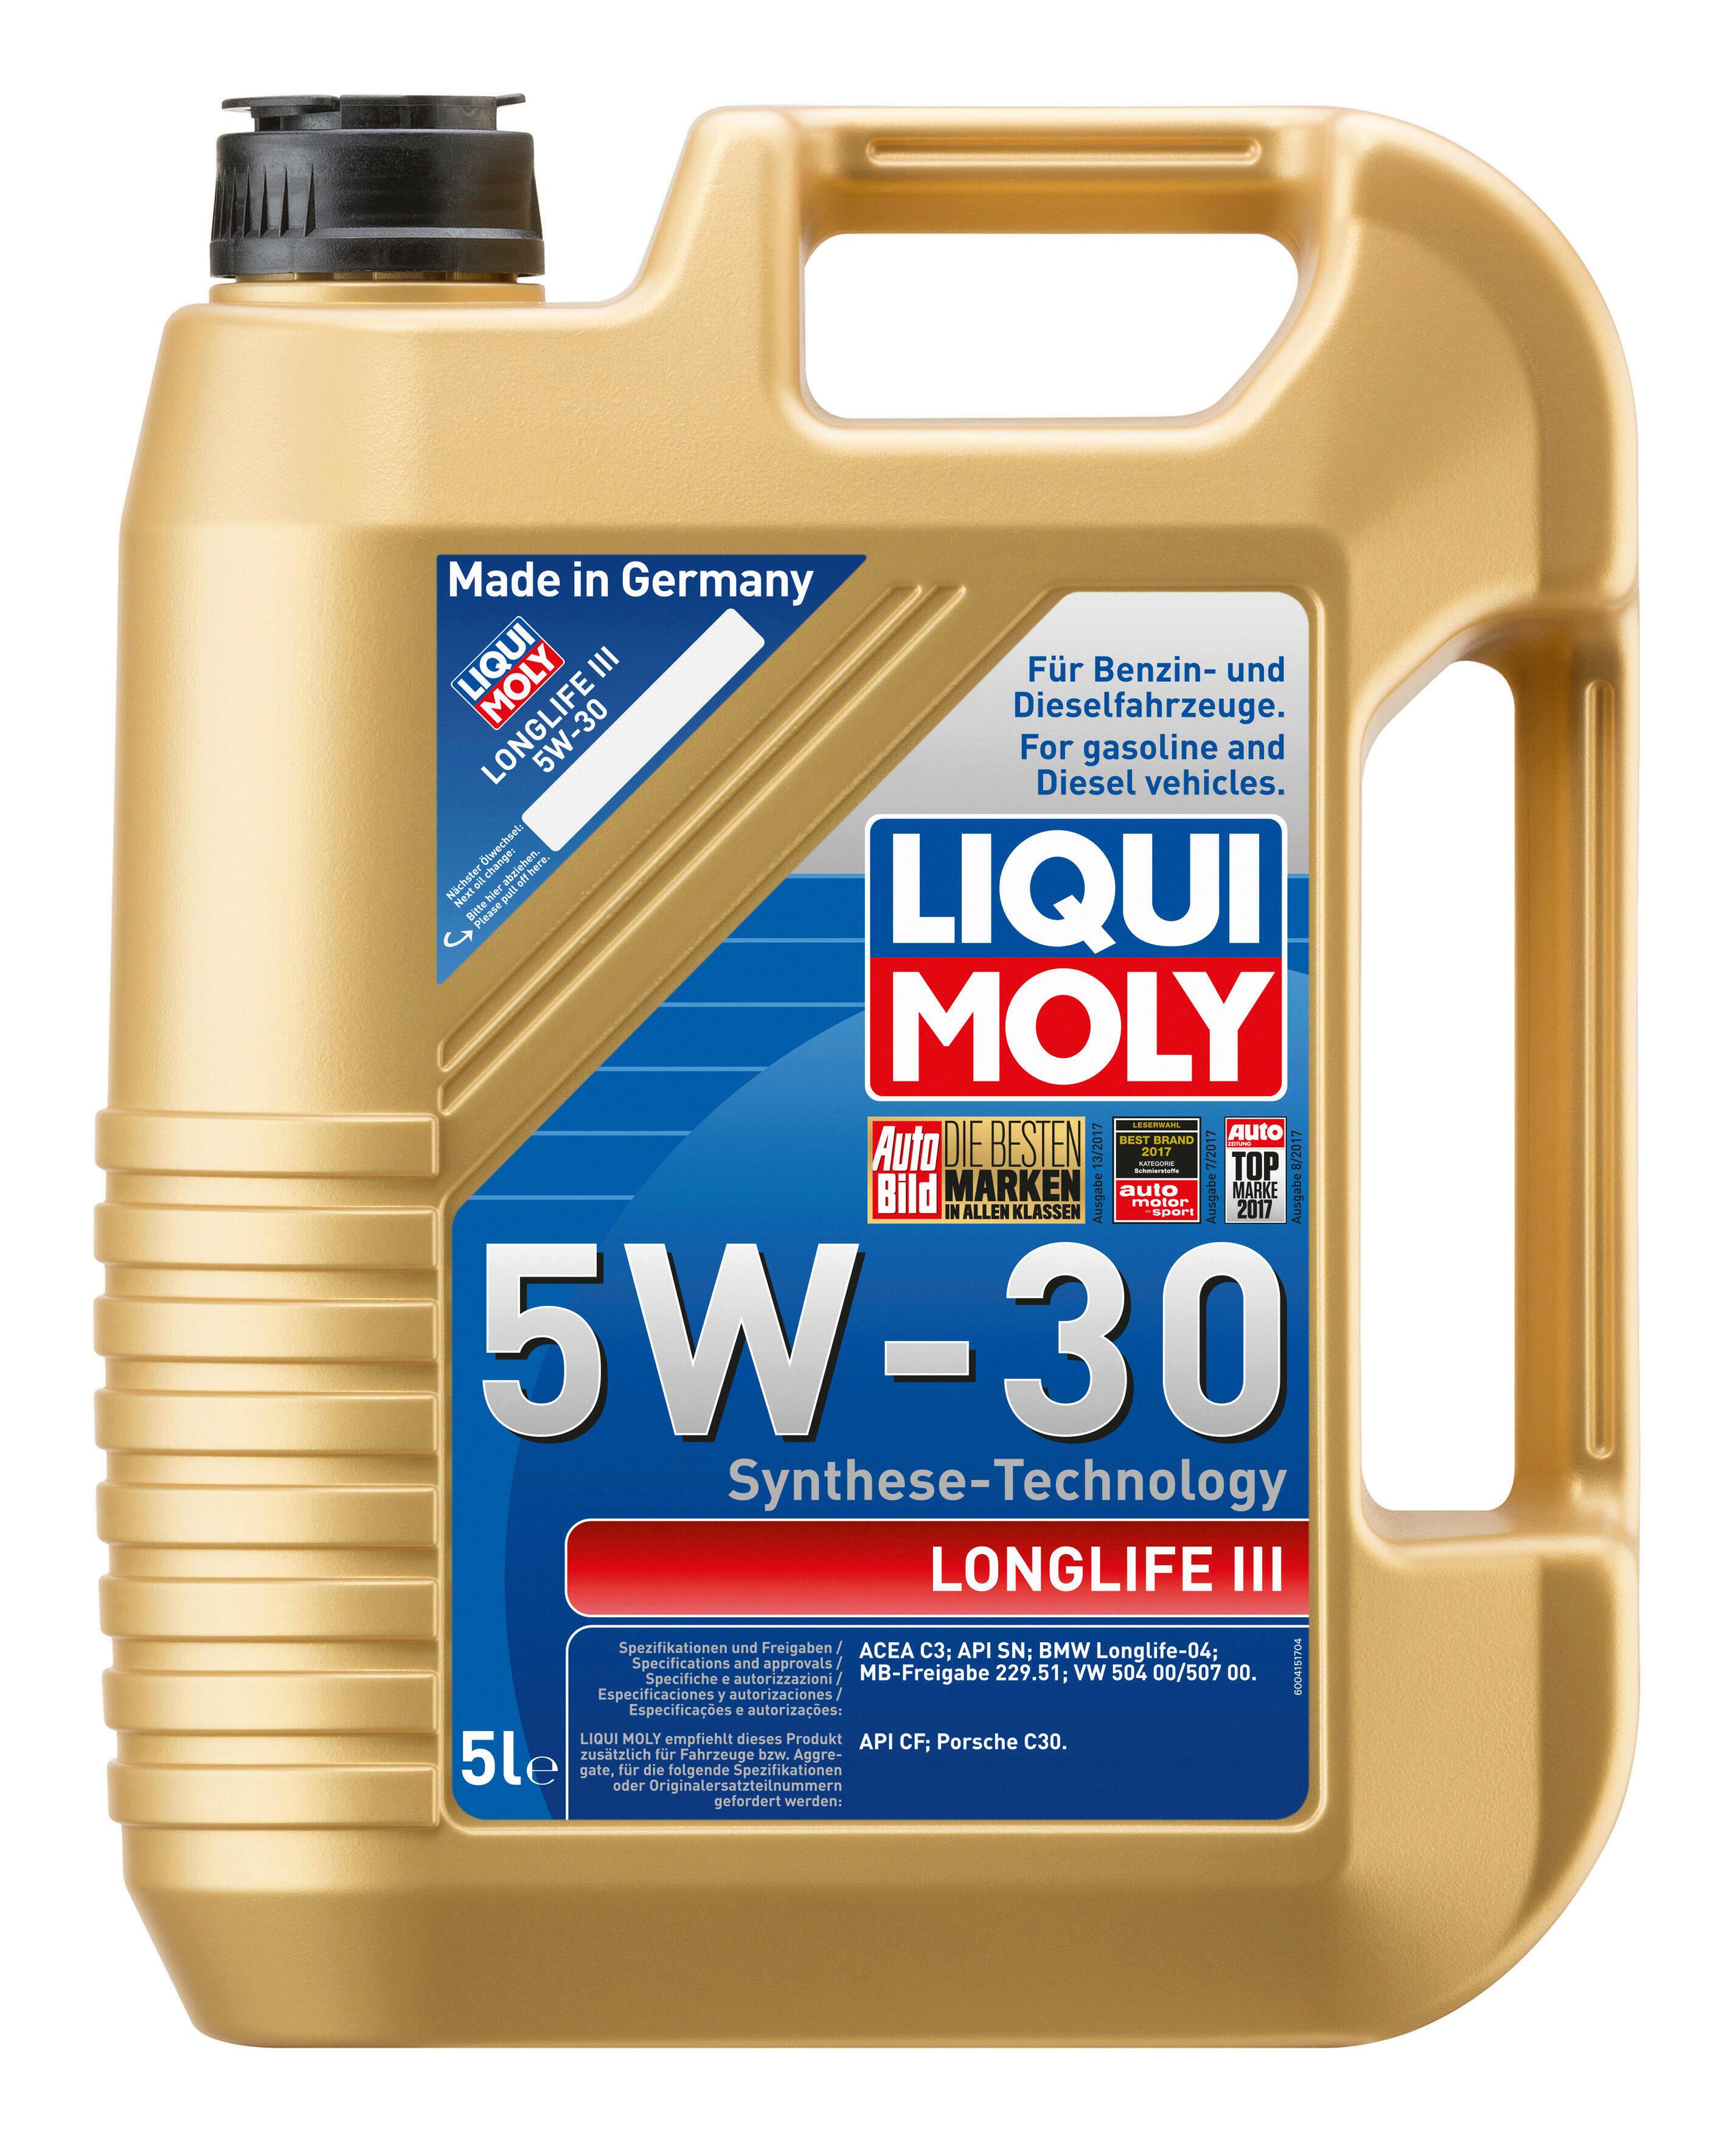 LIQUI MOLY Motoröl Longlife III 5W-30 5L